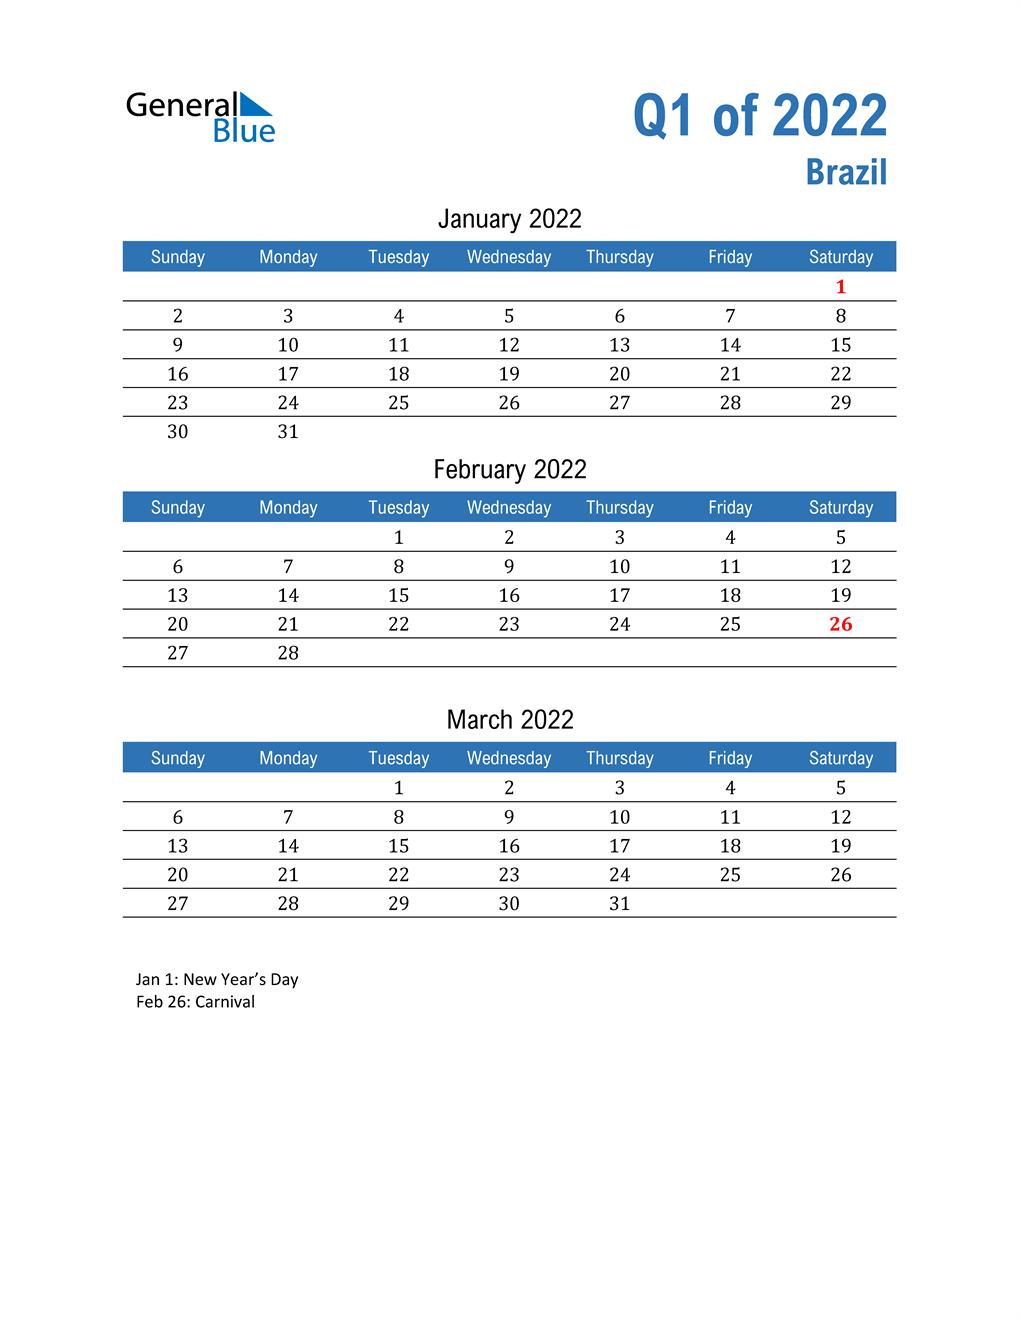 Brazil 2022 Quarterly Calendar